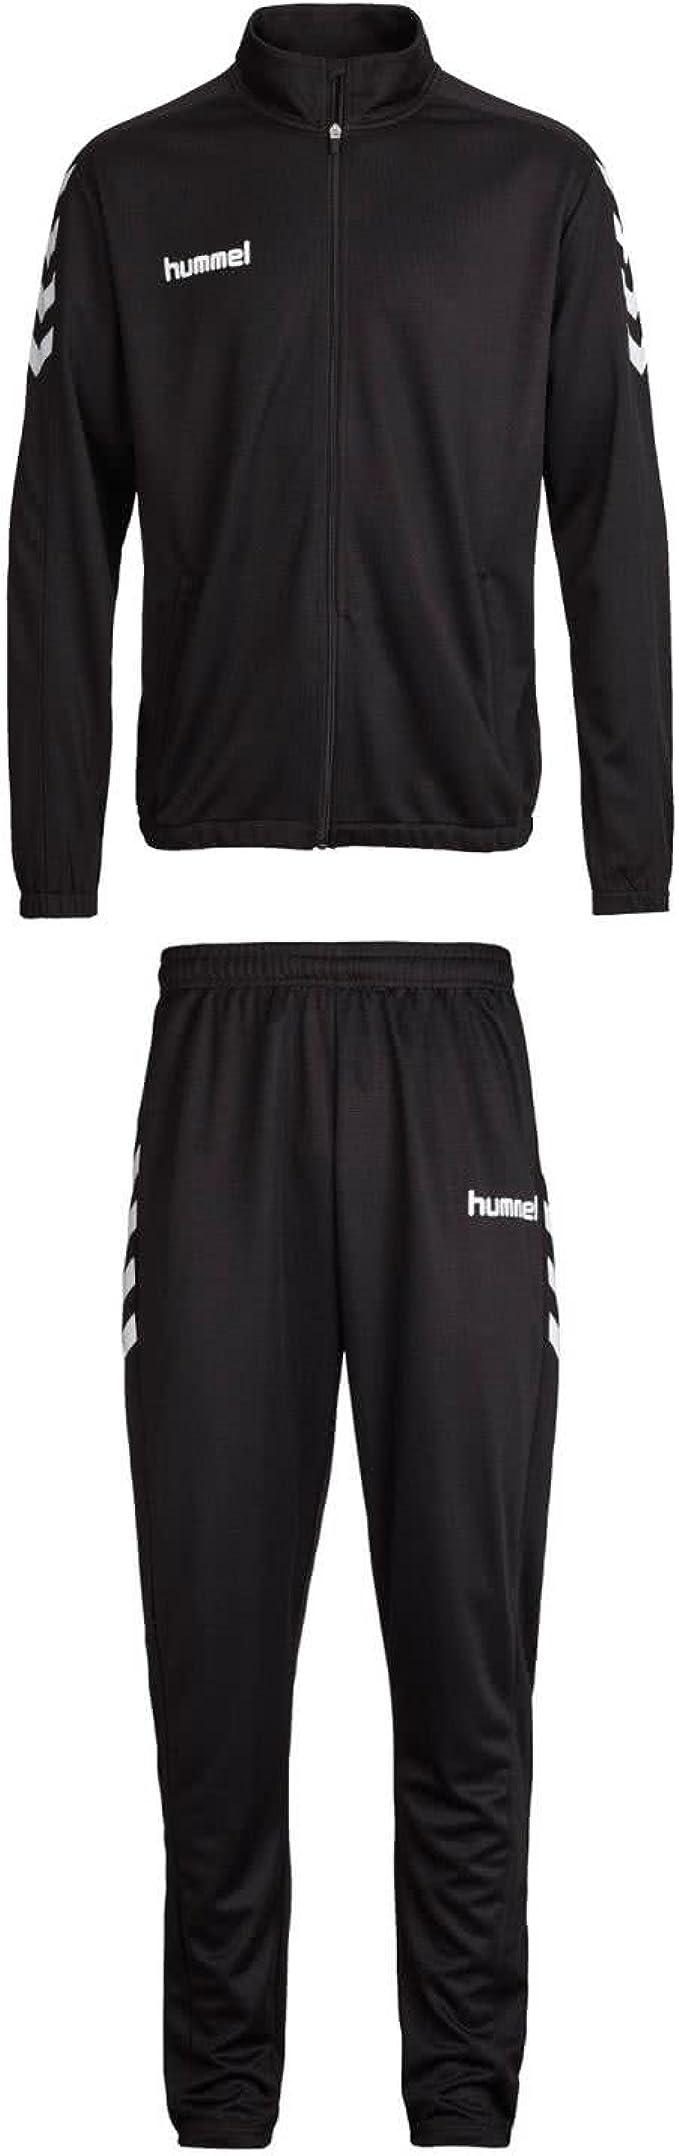 Hummel – Chándal para Hombre Core Poly Suit 36893 + 32173 Negro ...